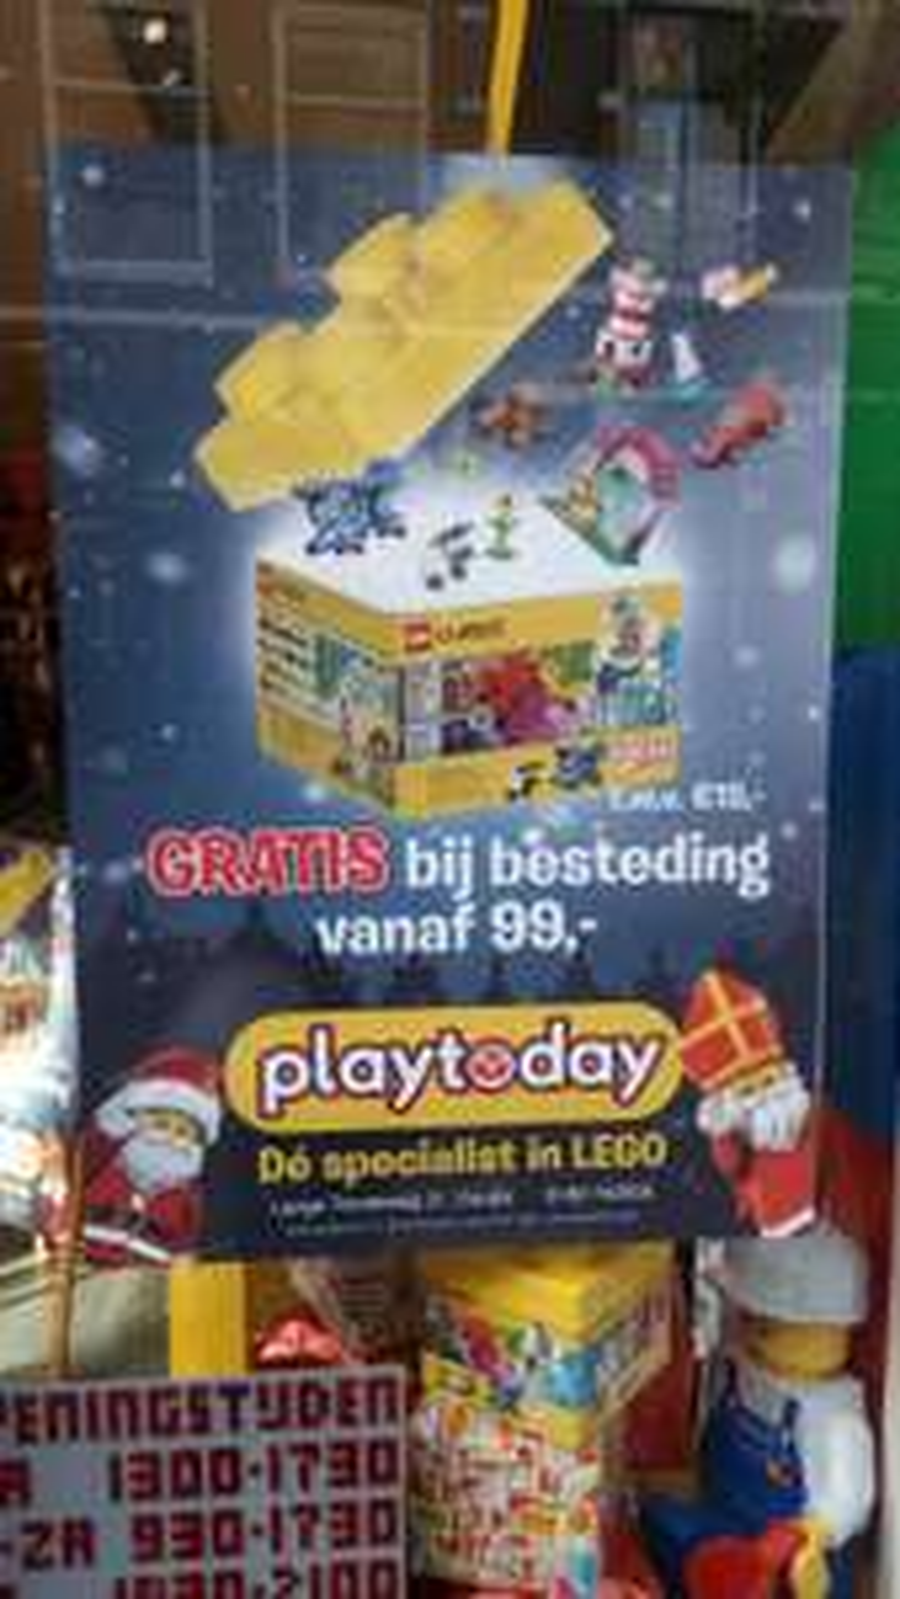 Gratis Lego Classic box bij besteding vanaf 99 euro